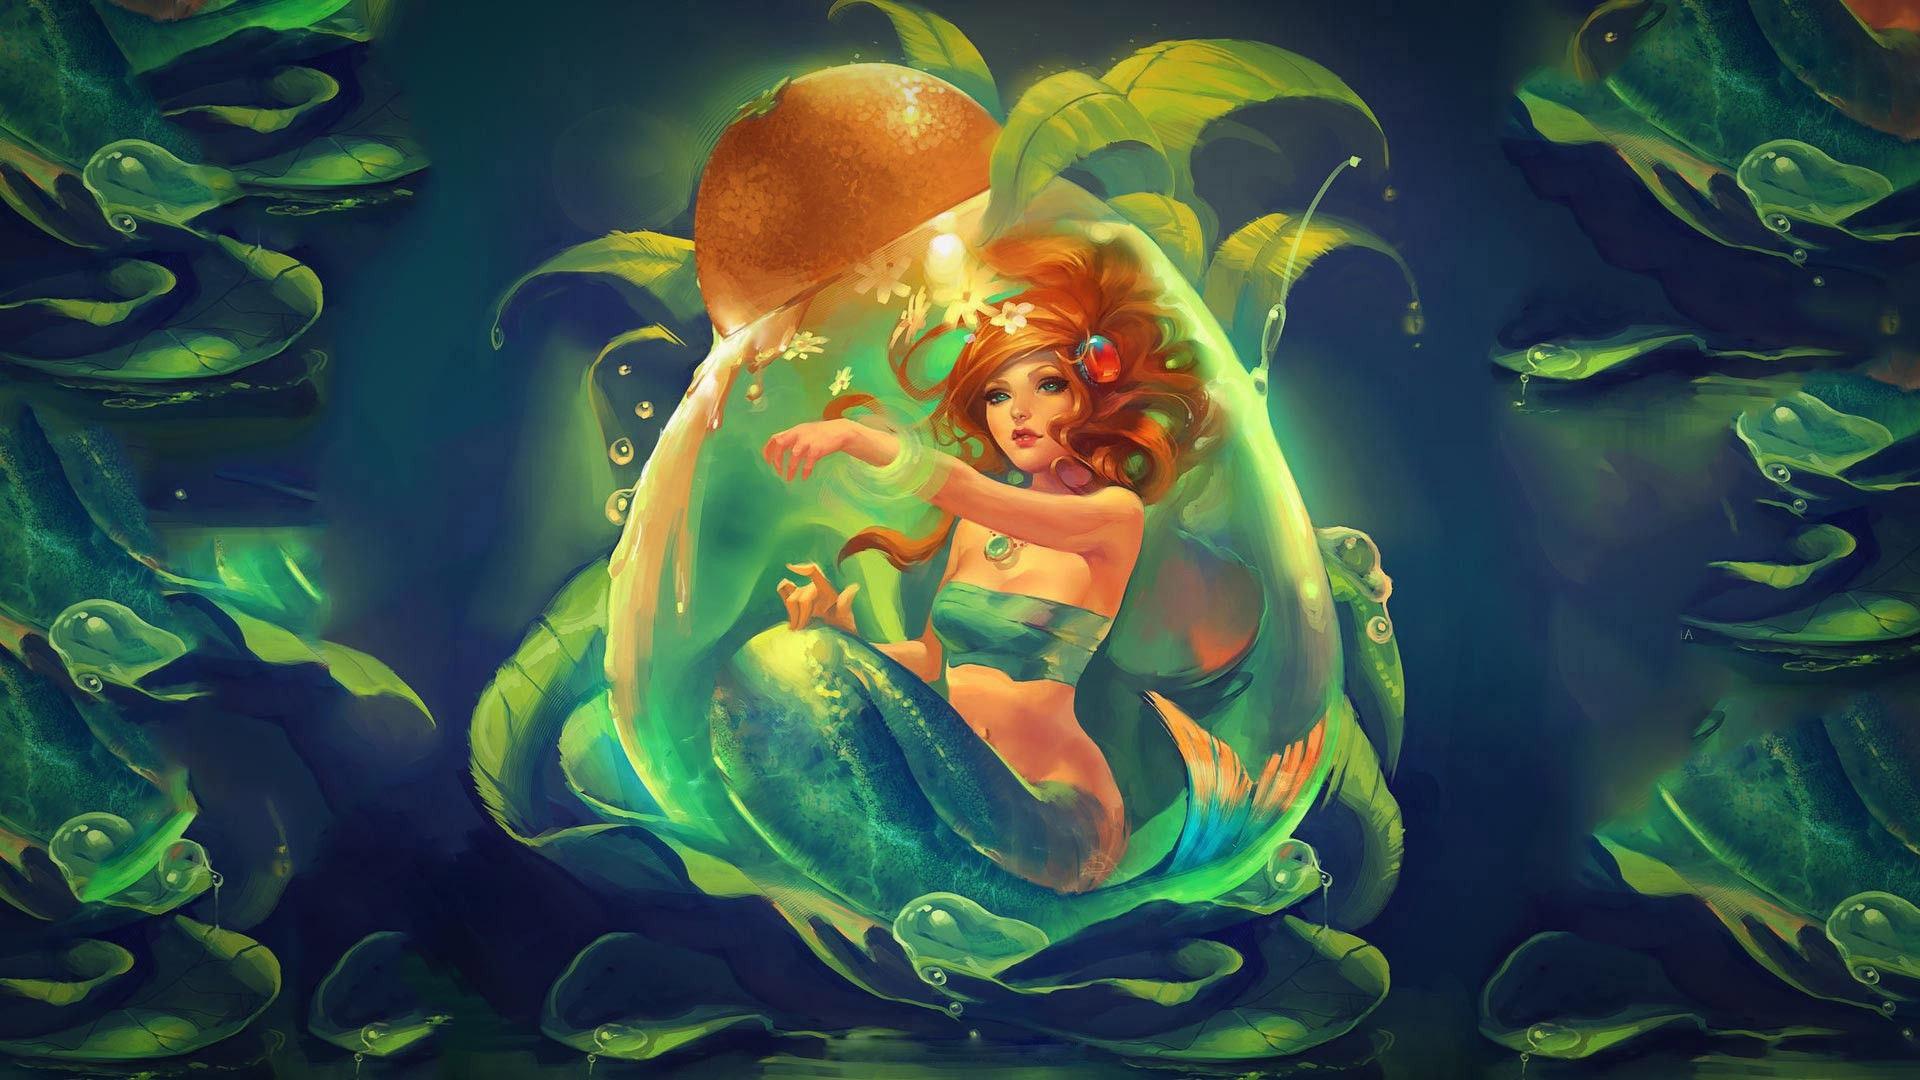 Lonely Boy And Girl Wallpaper Free Desktop Mermaid Wallpapers Pixels Talk